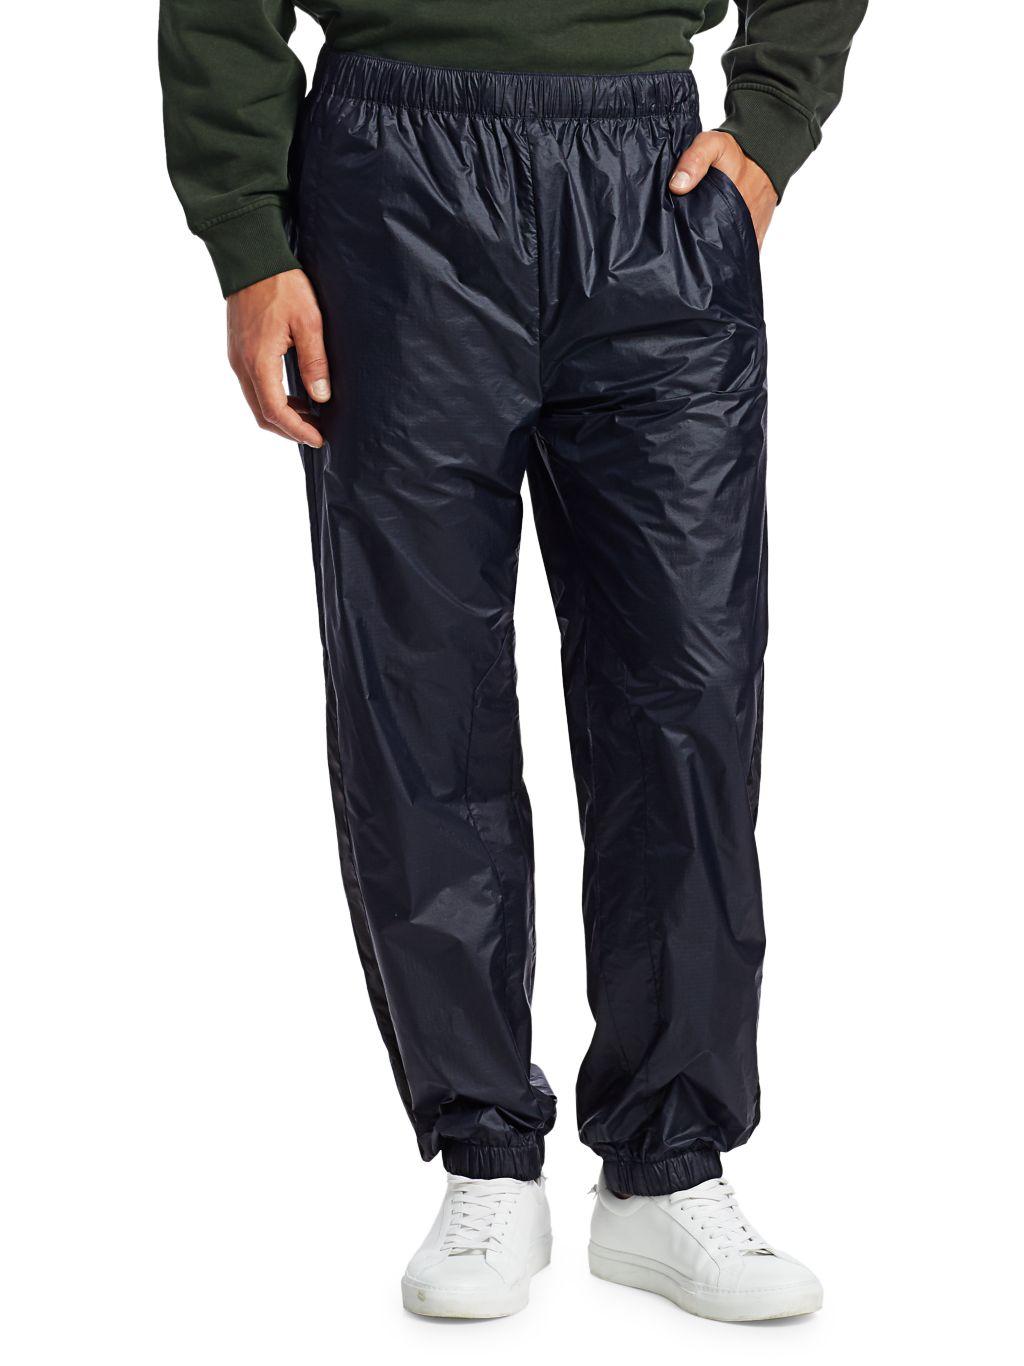 Acne Pegasus Track Pants